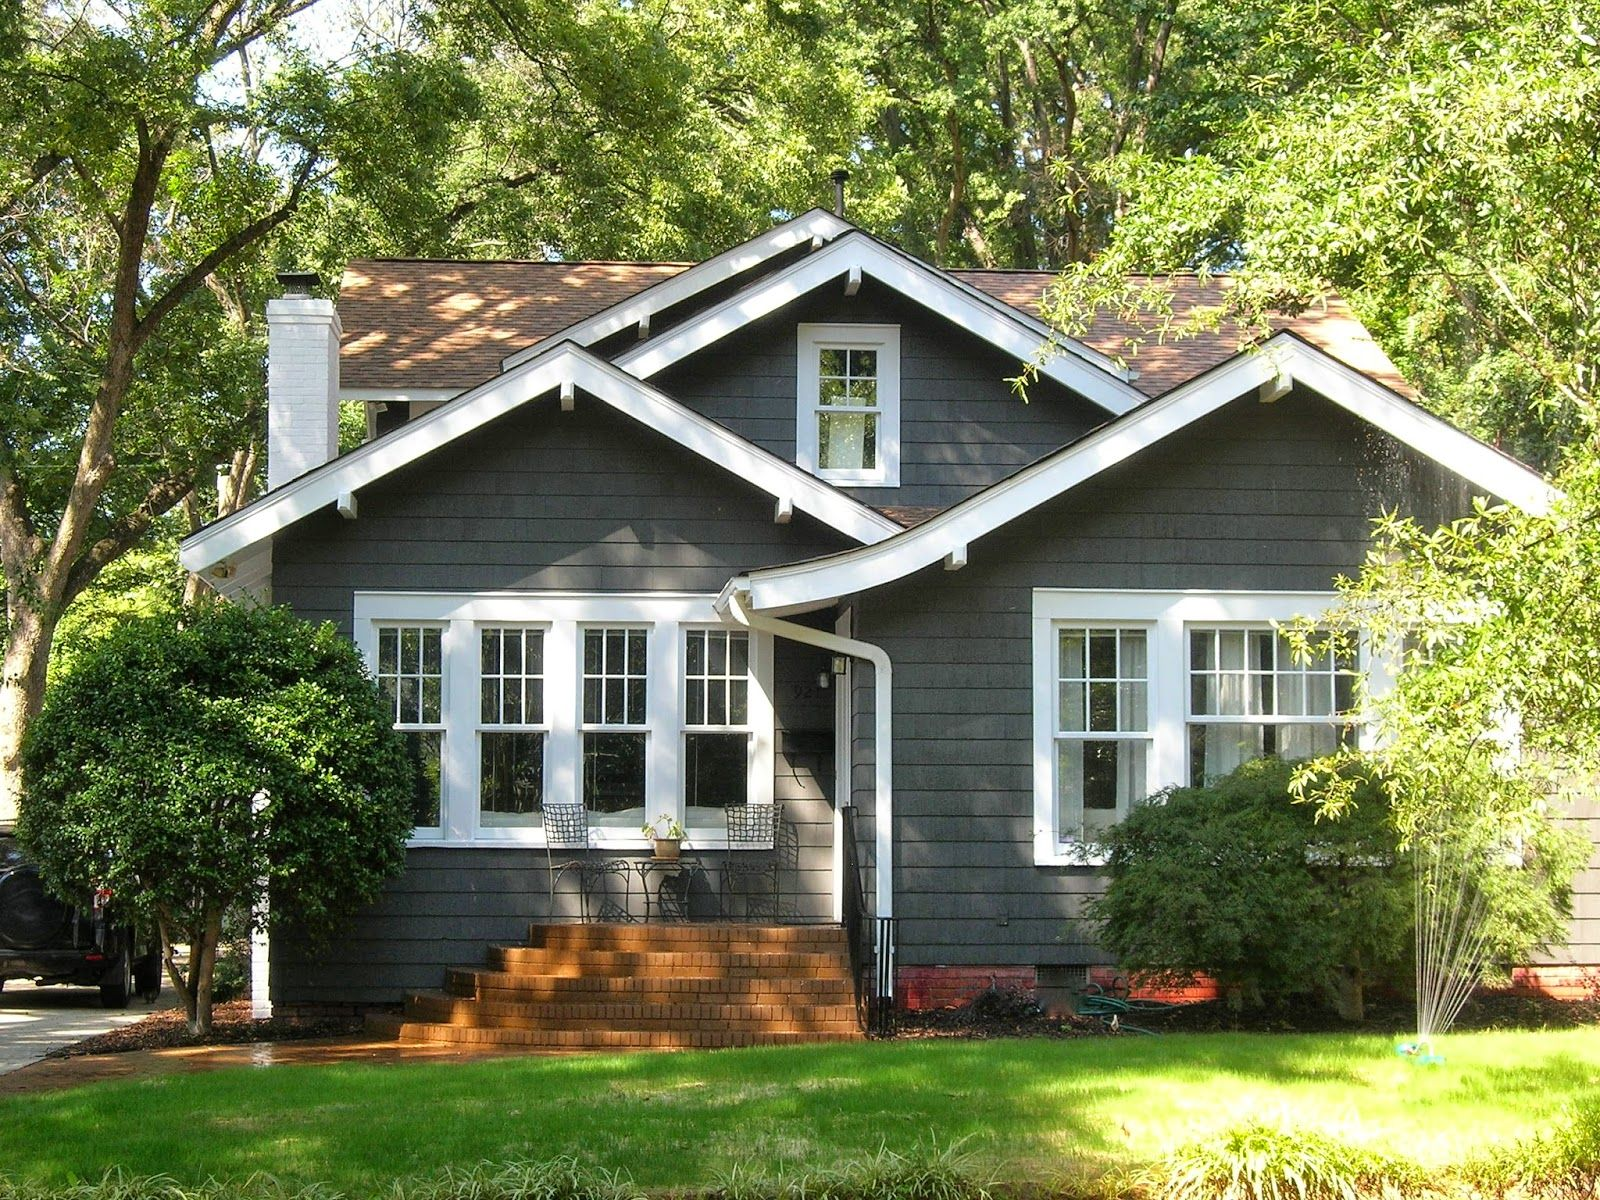 The Perfect Paint Schemes for House Exterior  Exterior Designs  Cottage exterior colors